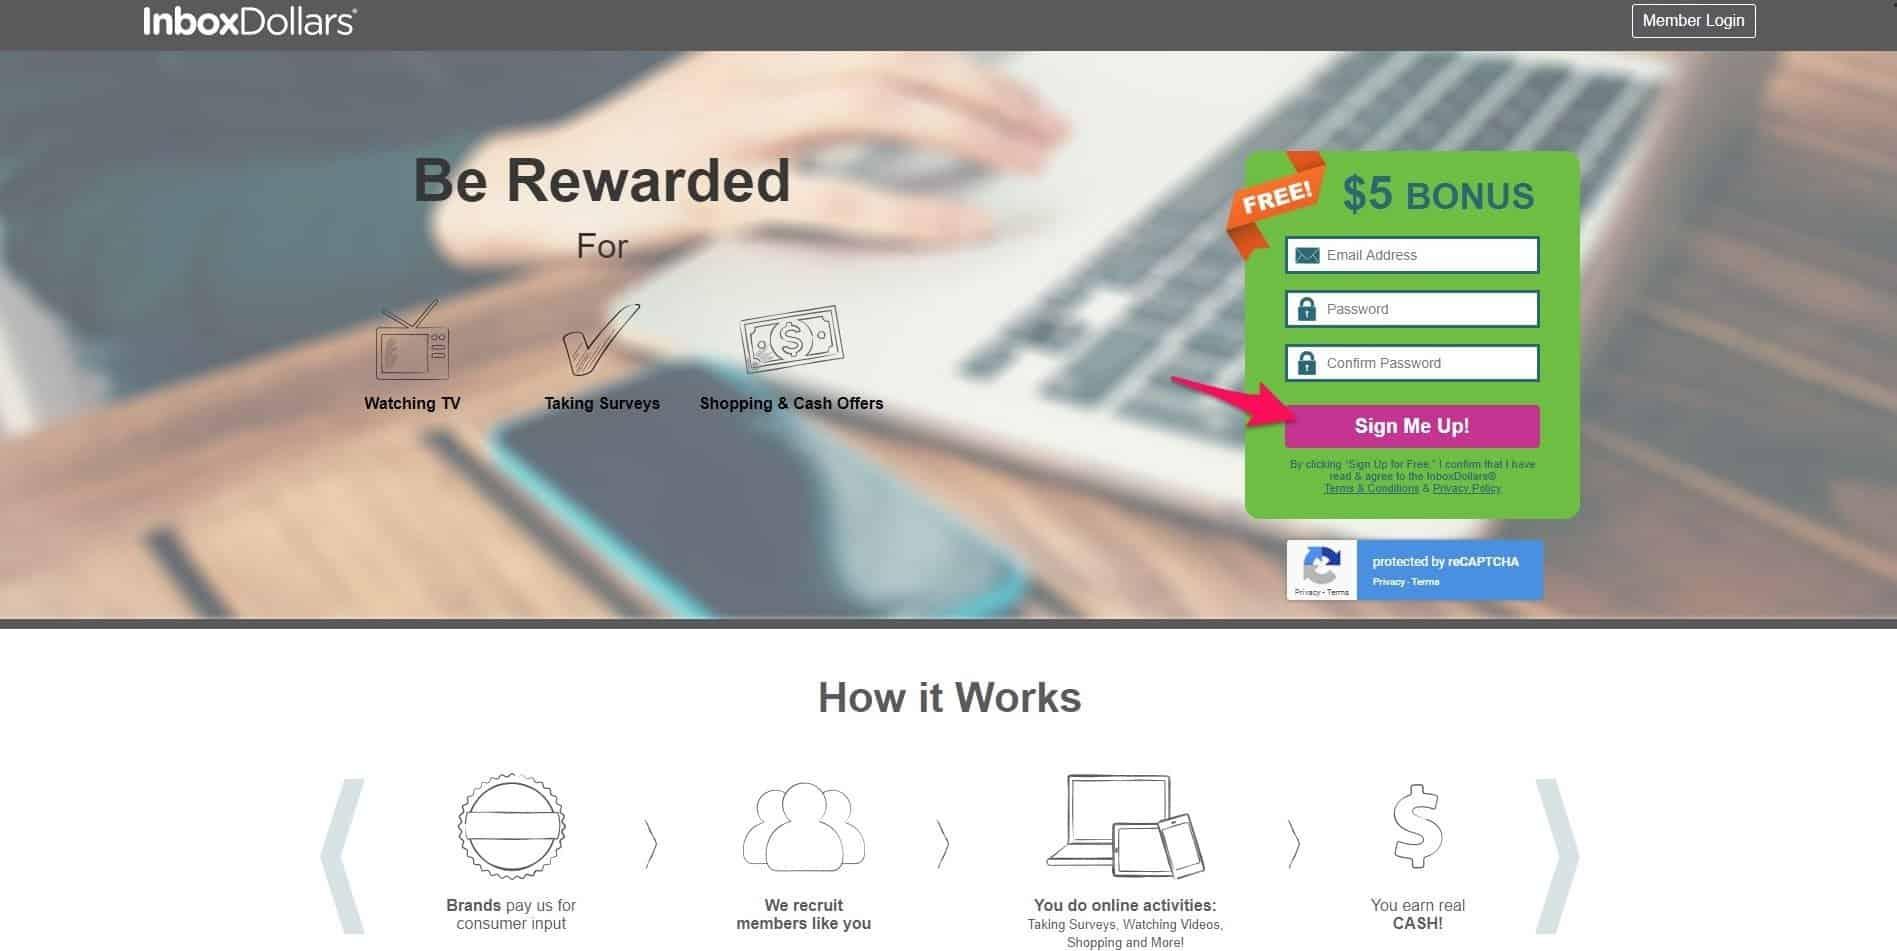 inboxdollars login for online surveys